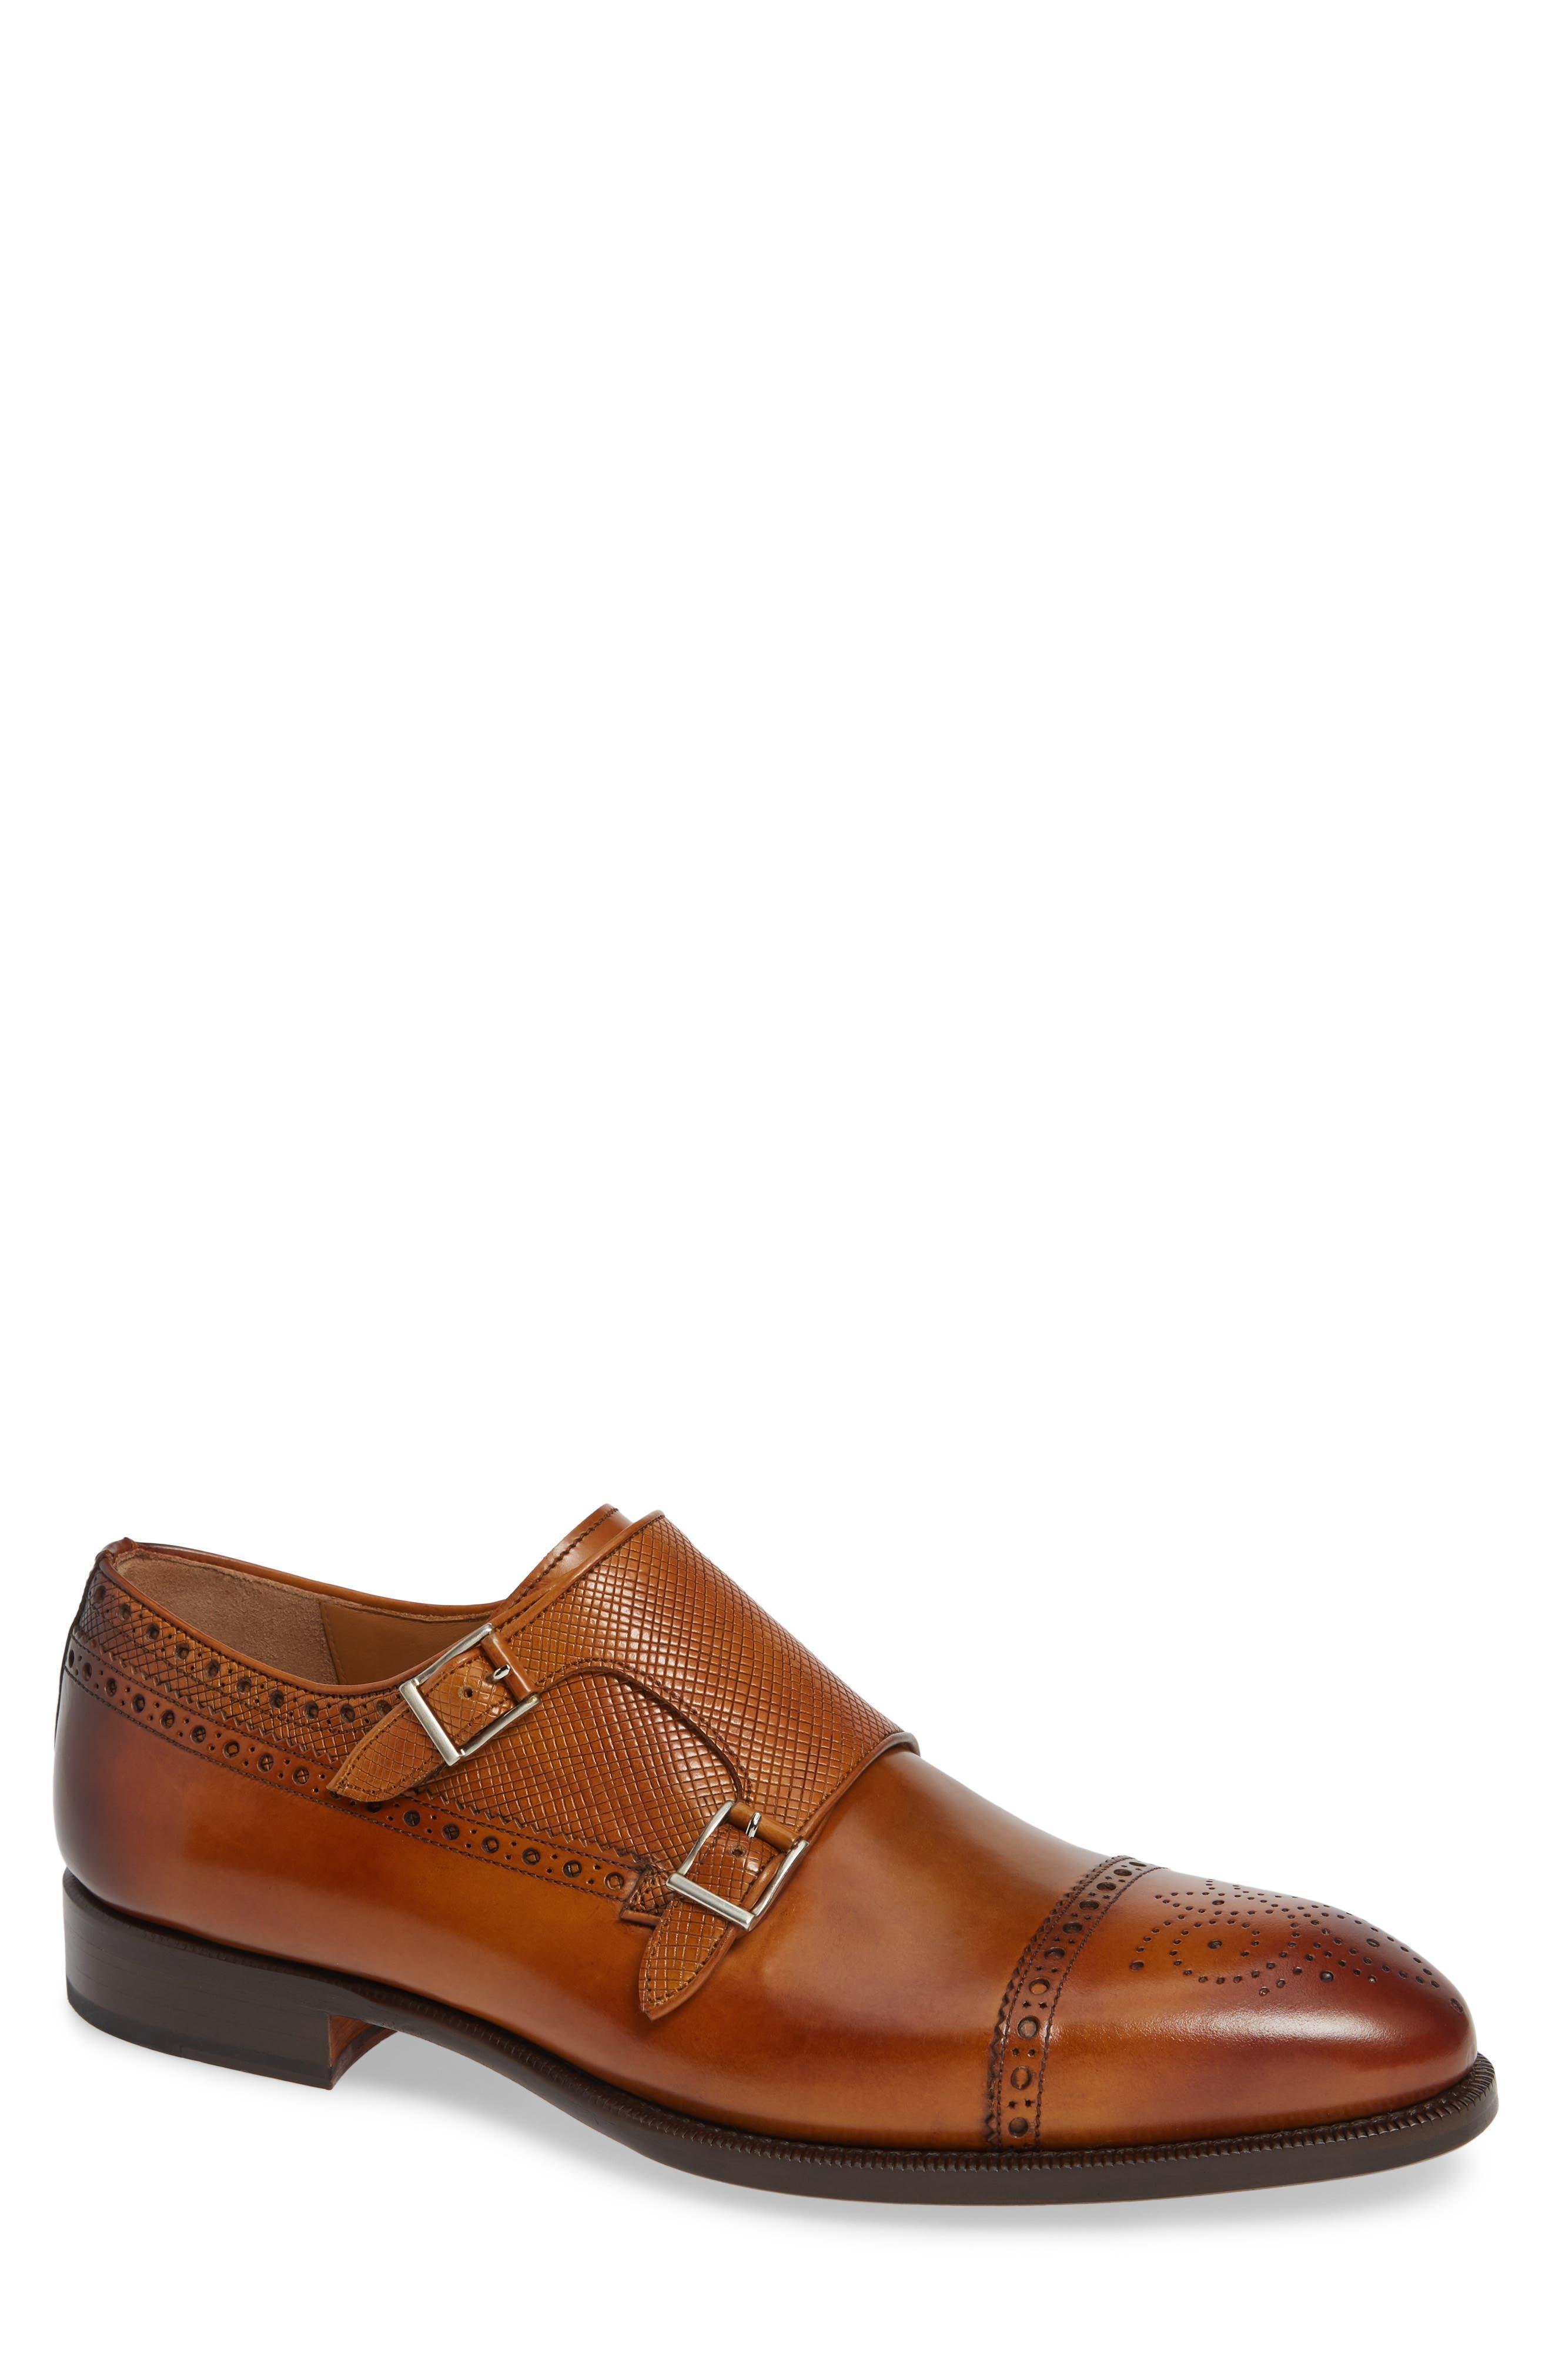 Valda Double Strap Cap Toe Monk Shoe,                         Main,                         color, BROWN LEATHER